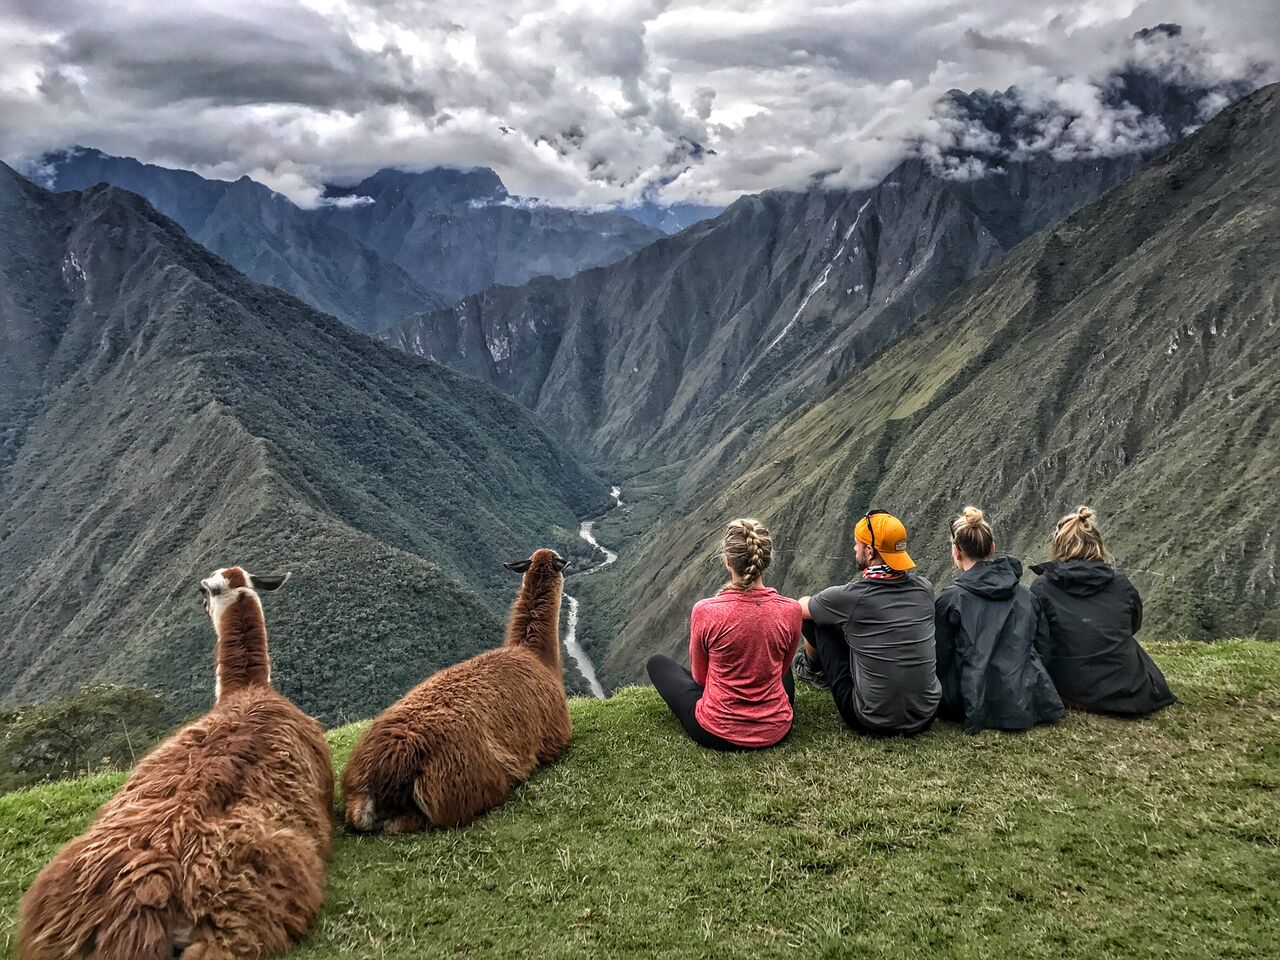 A bunch of llamas